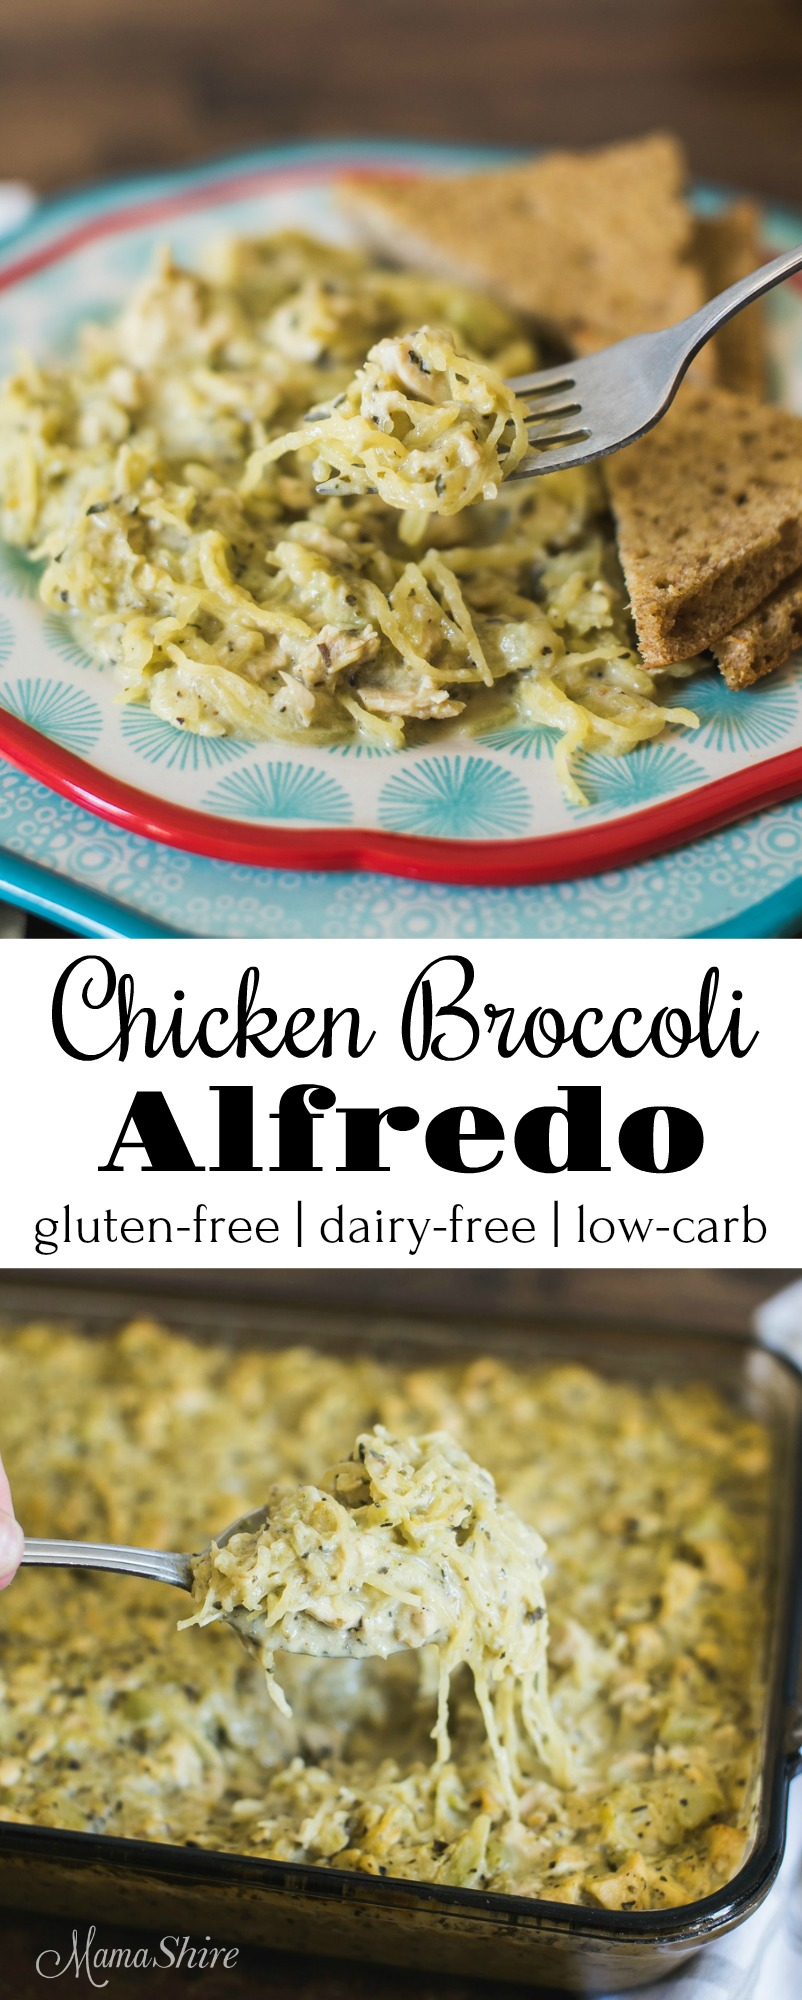 Chicken Broccoli Alfredo Gluten-Free Dairy-Free Low-Carb THM-S #keto #trimhealthymama #lowcarb #dairyfree